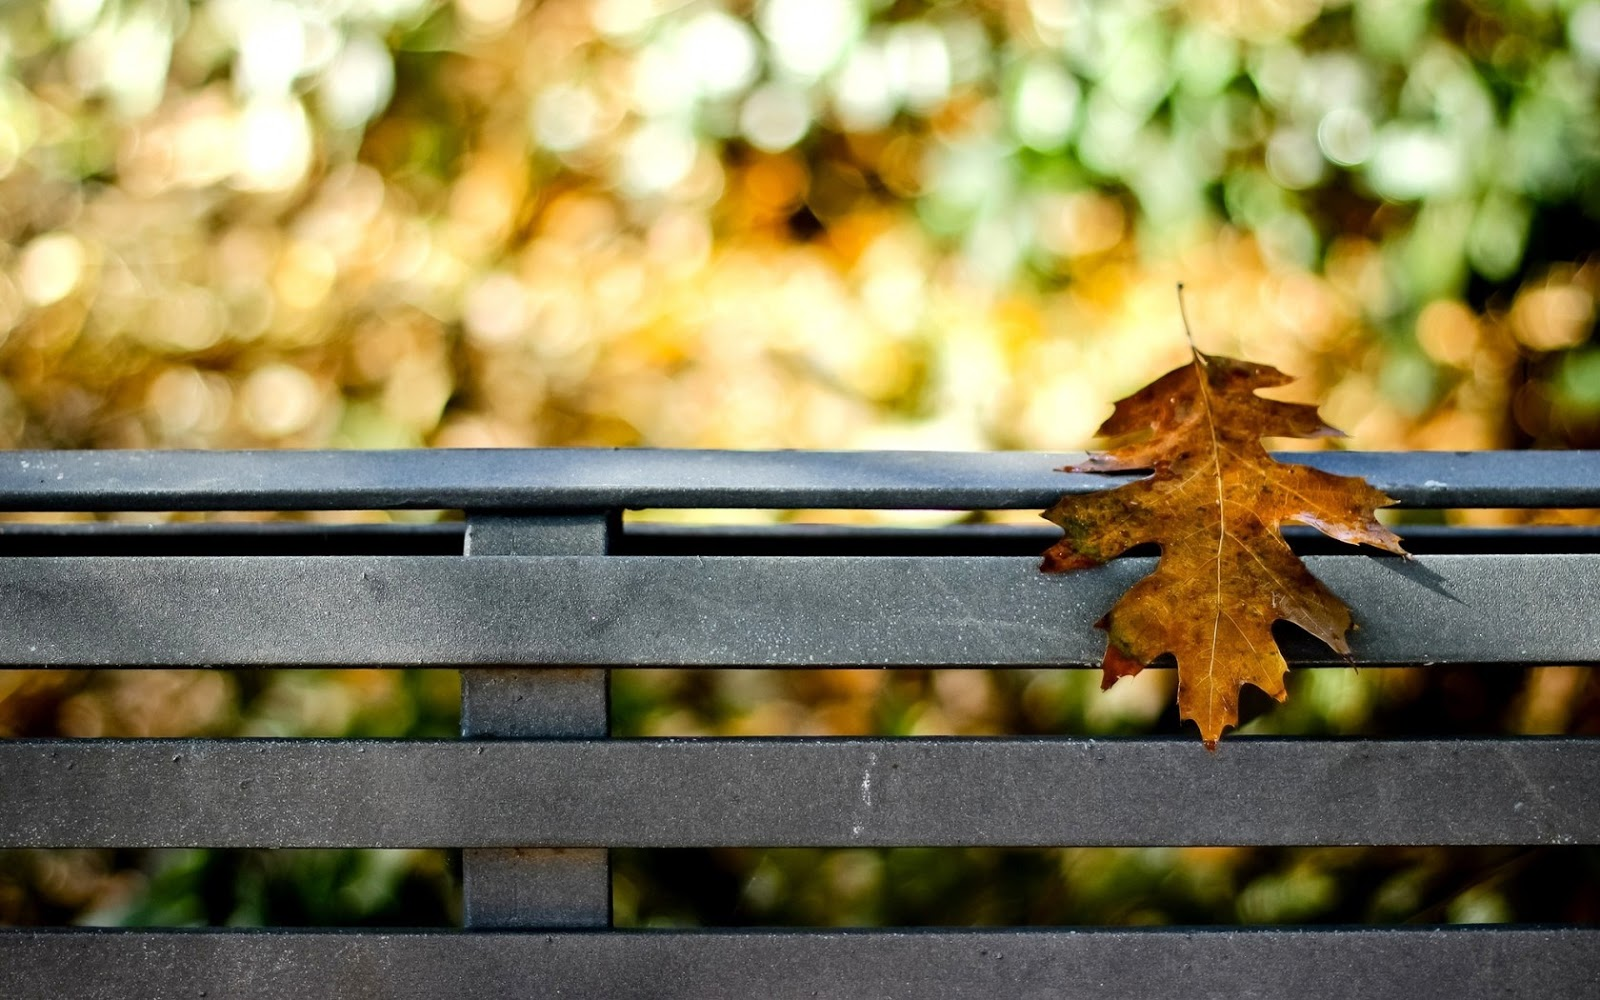 Fall Foliage Desktop Wallpaper صور خلفيات أوراق الشجر جميلة عالية الدقة مداد الجليد